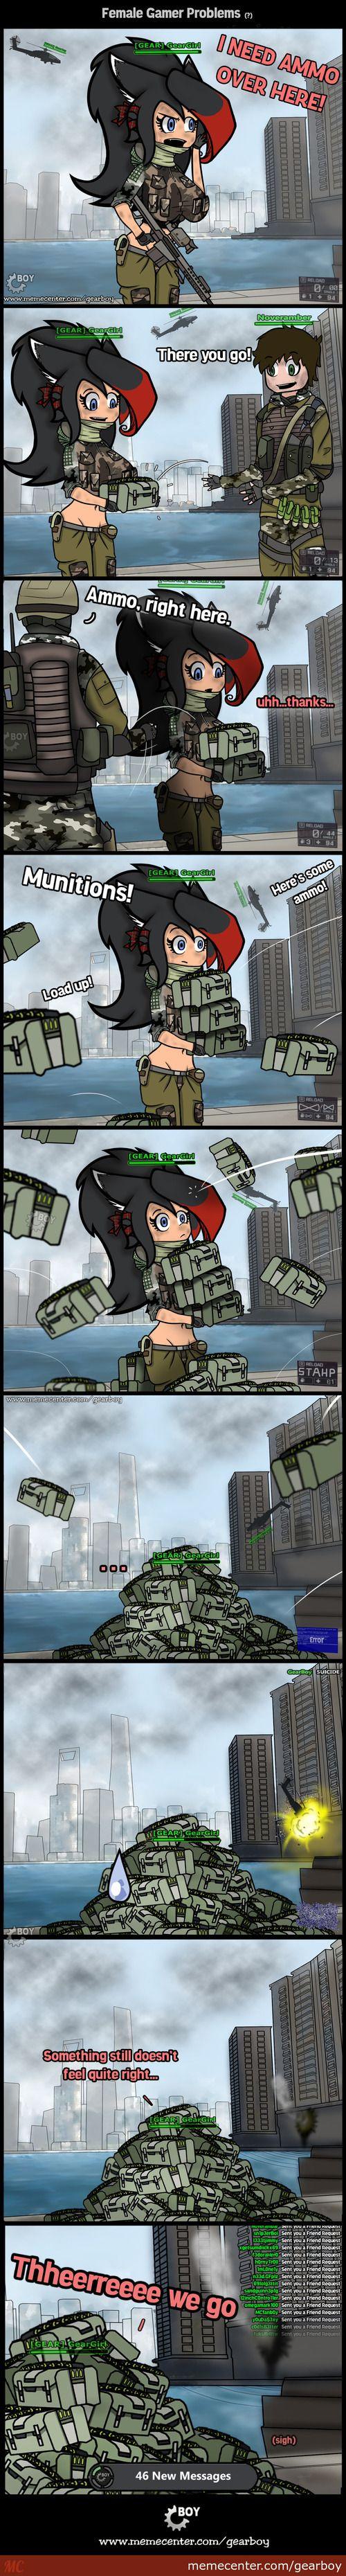 Gaming Moments: Battlefield 4 #Meme #FunnyMeme